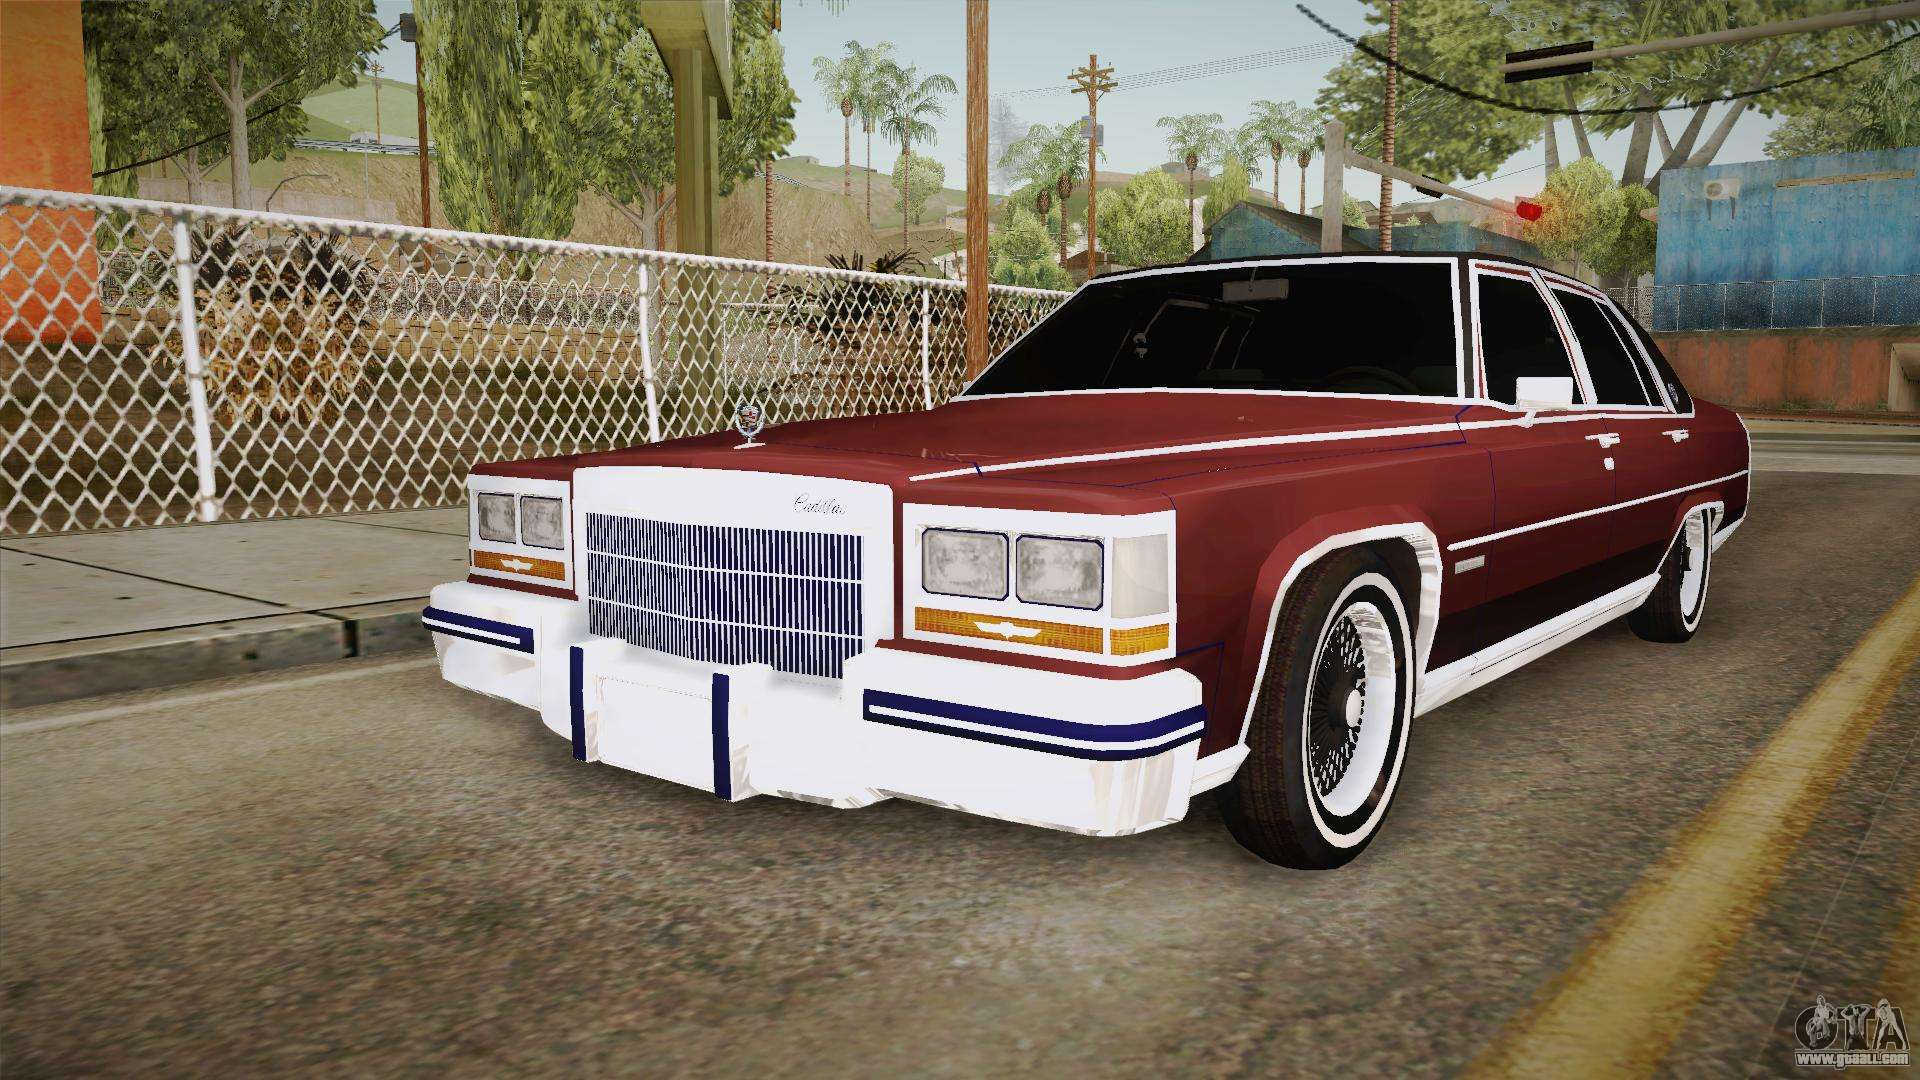 Cadillac Fleetwood Brougham Low Rider 1980 for GTA San Andreas